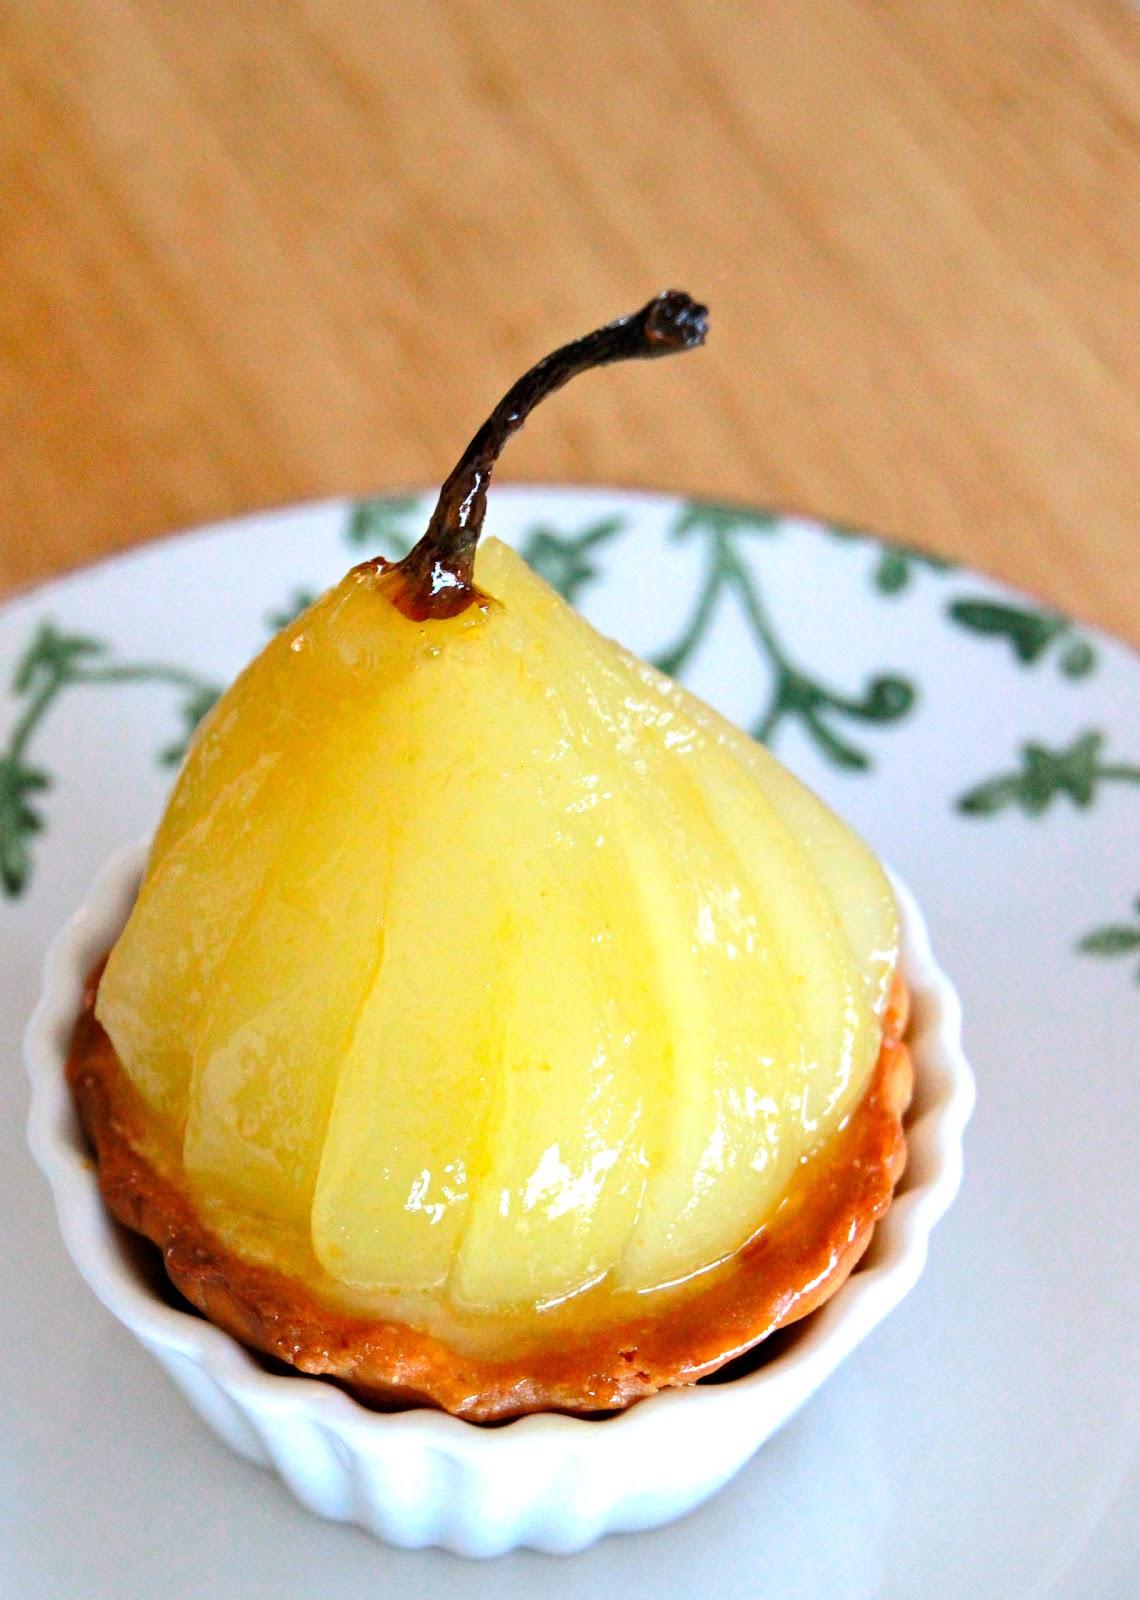 Frangipane**, Almond Paste, Marzipan, and Other Nut Frangipane's on ...